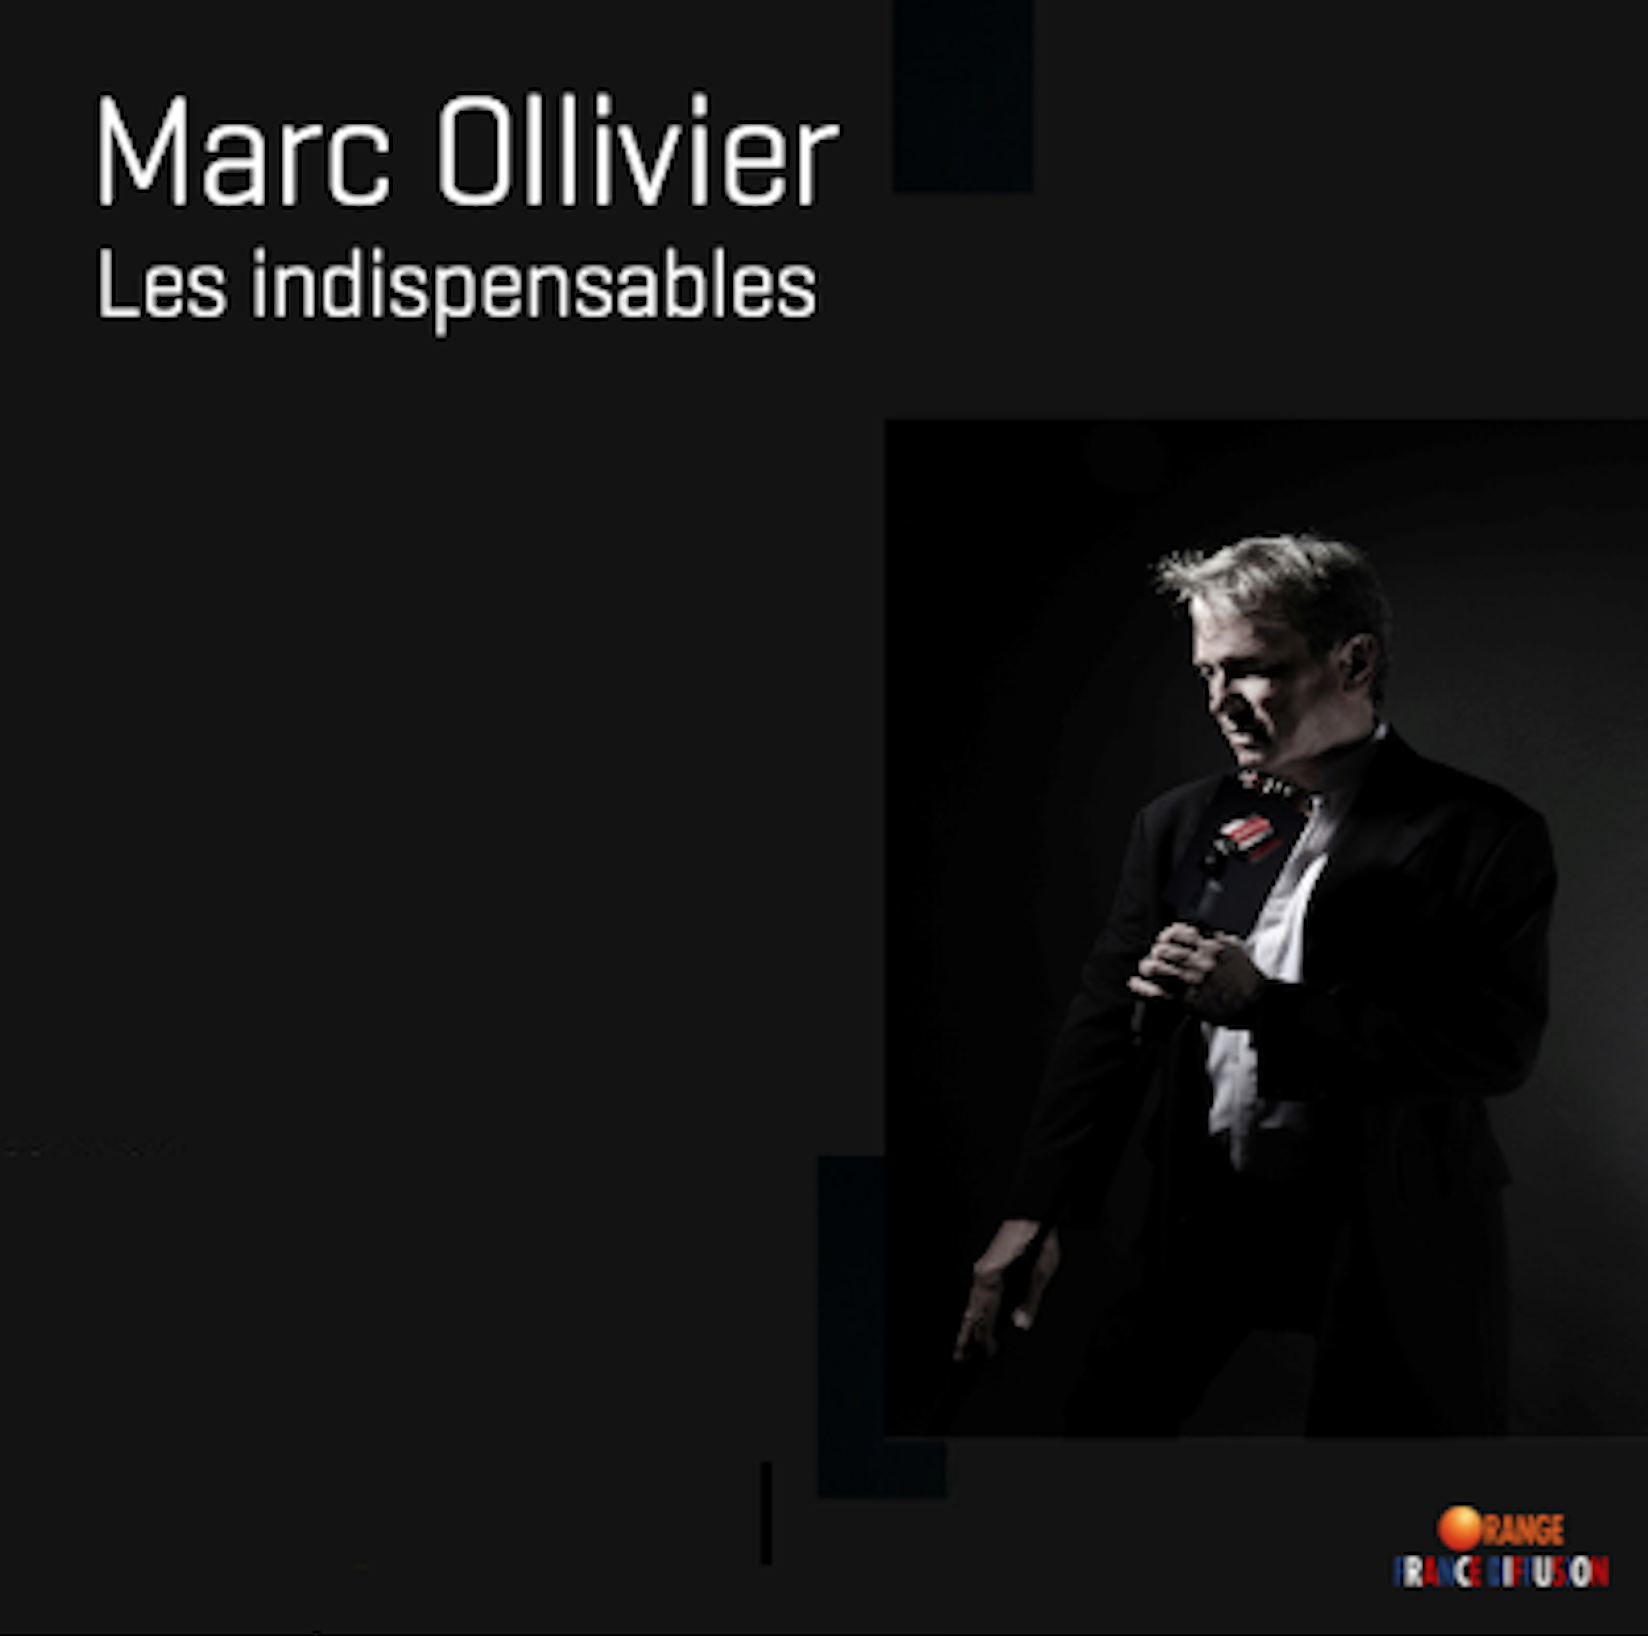 Marc Ollivier - Les indispensables